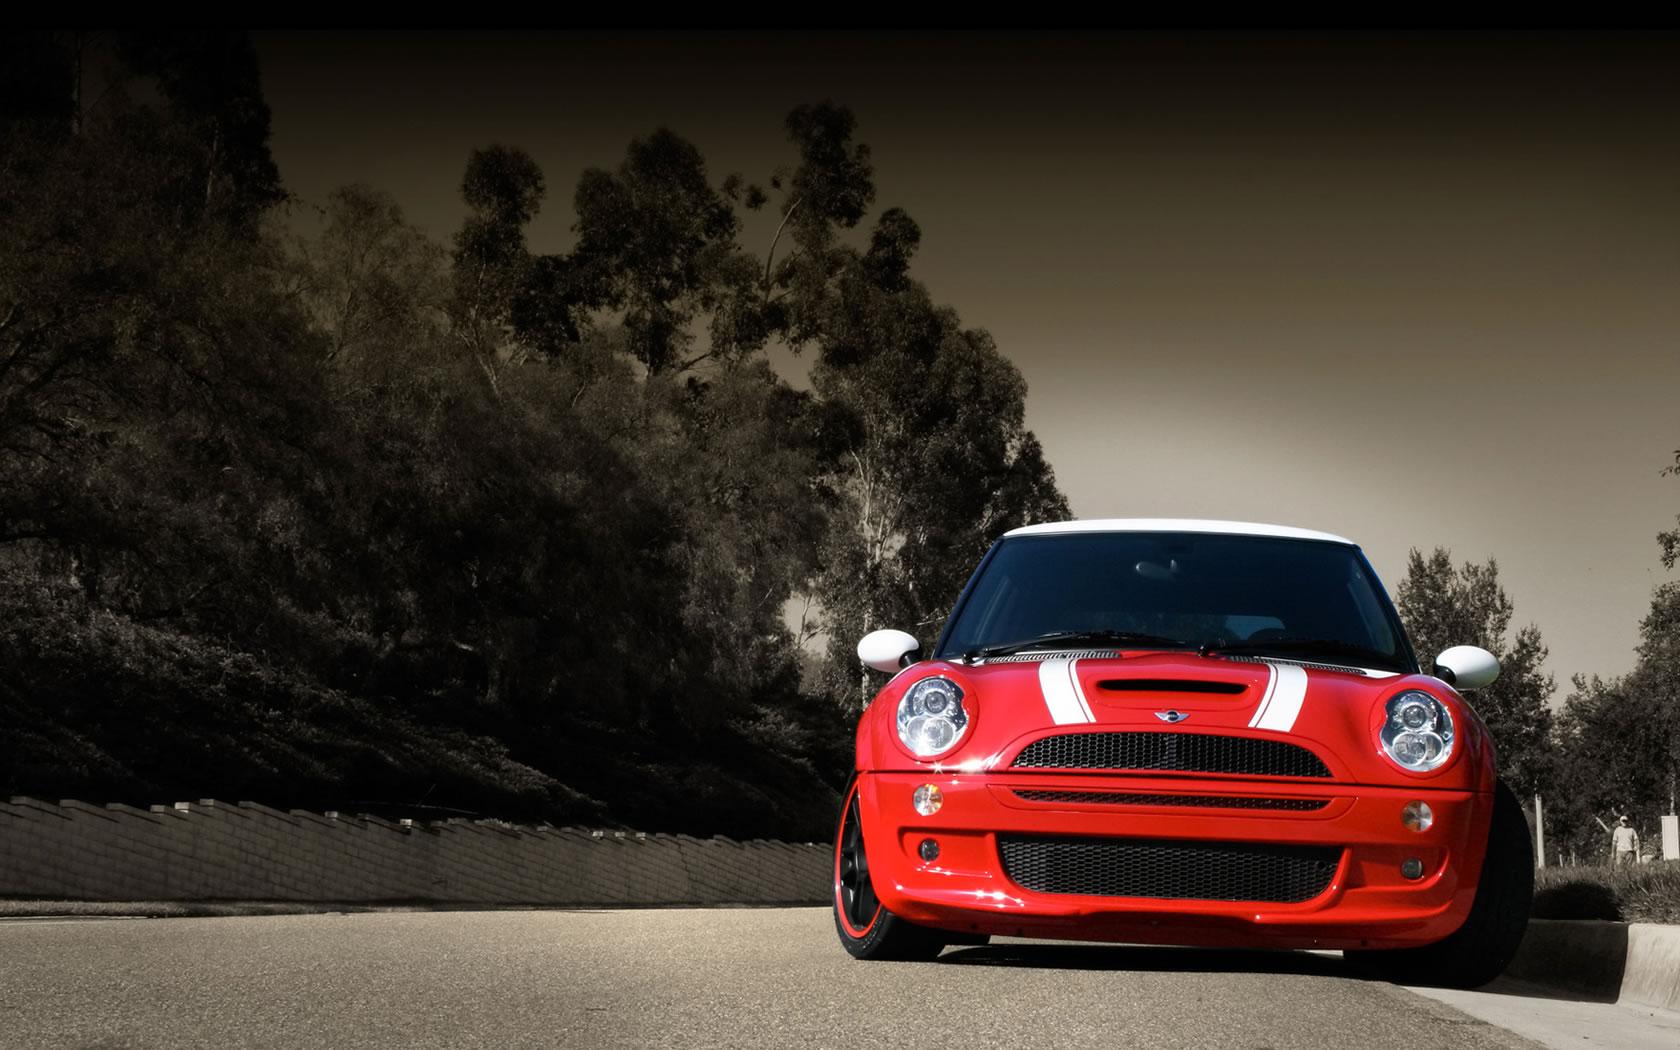 Download the Race Red Mini Cooper Wallpaper Race Red Mini Cooper 1680x1050